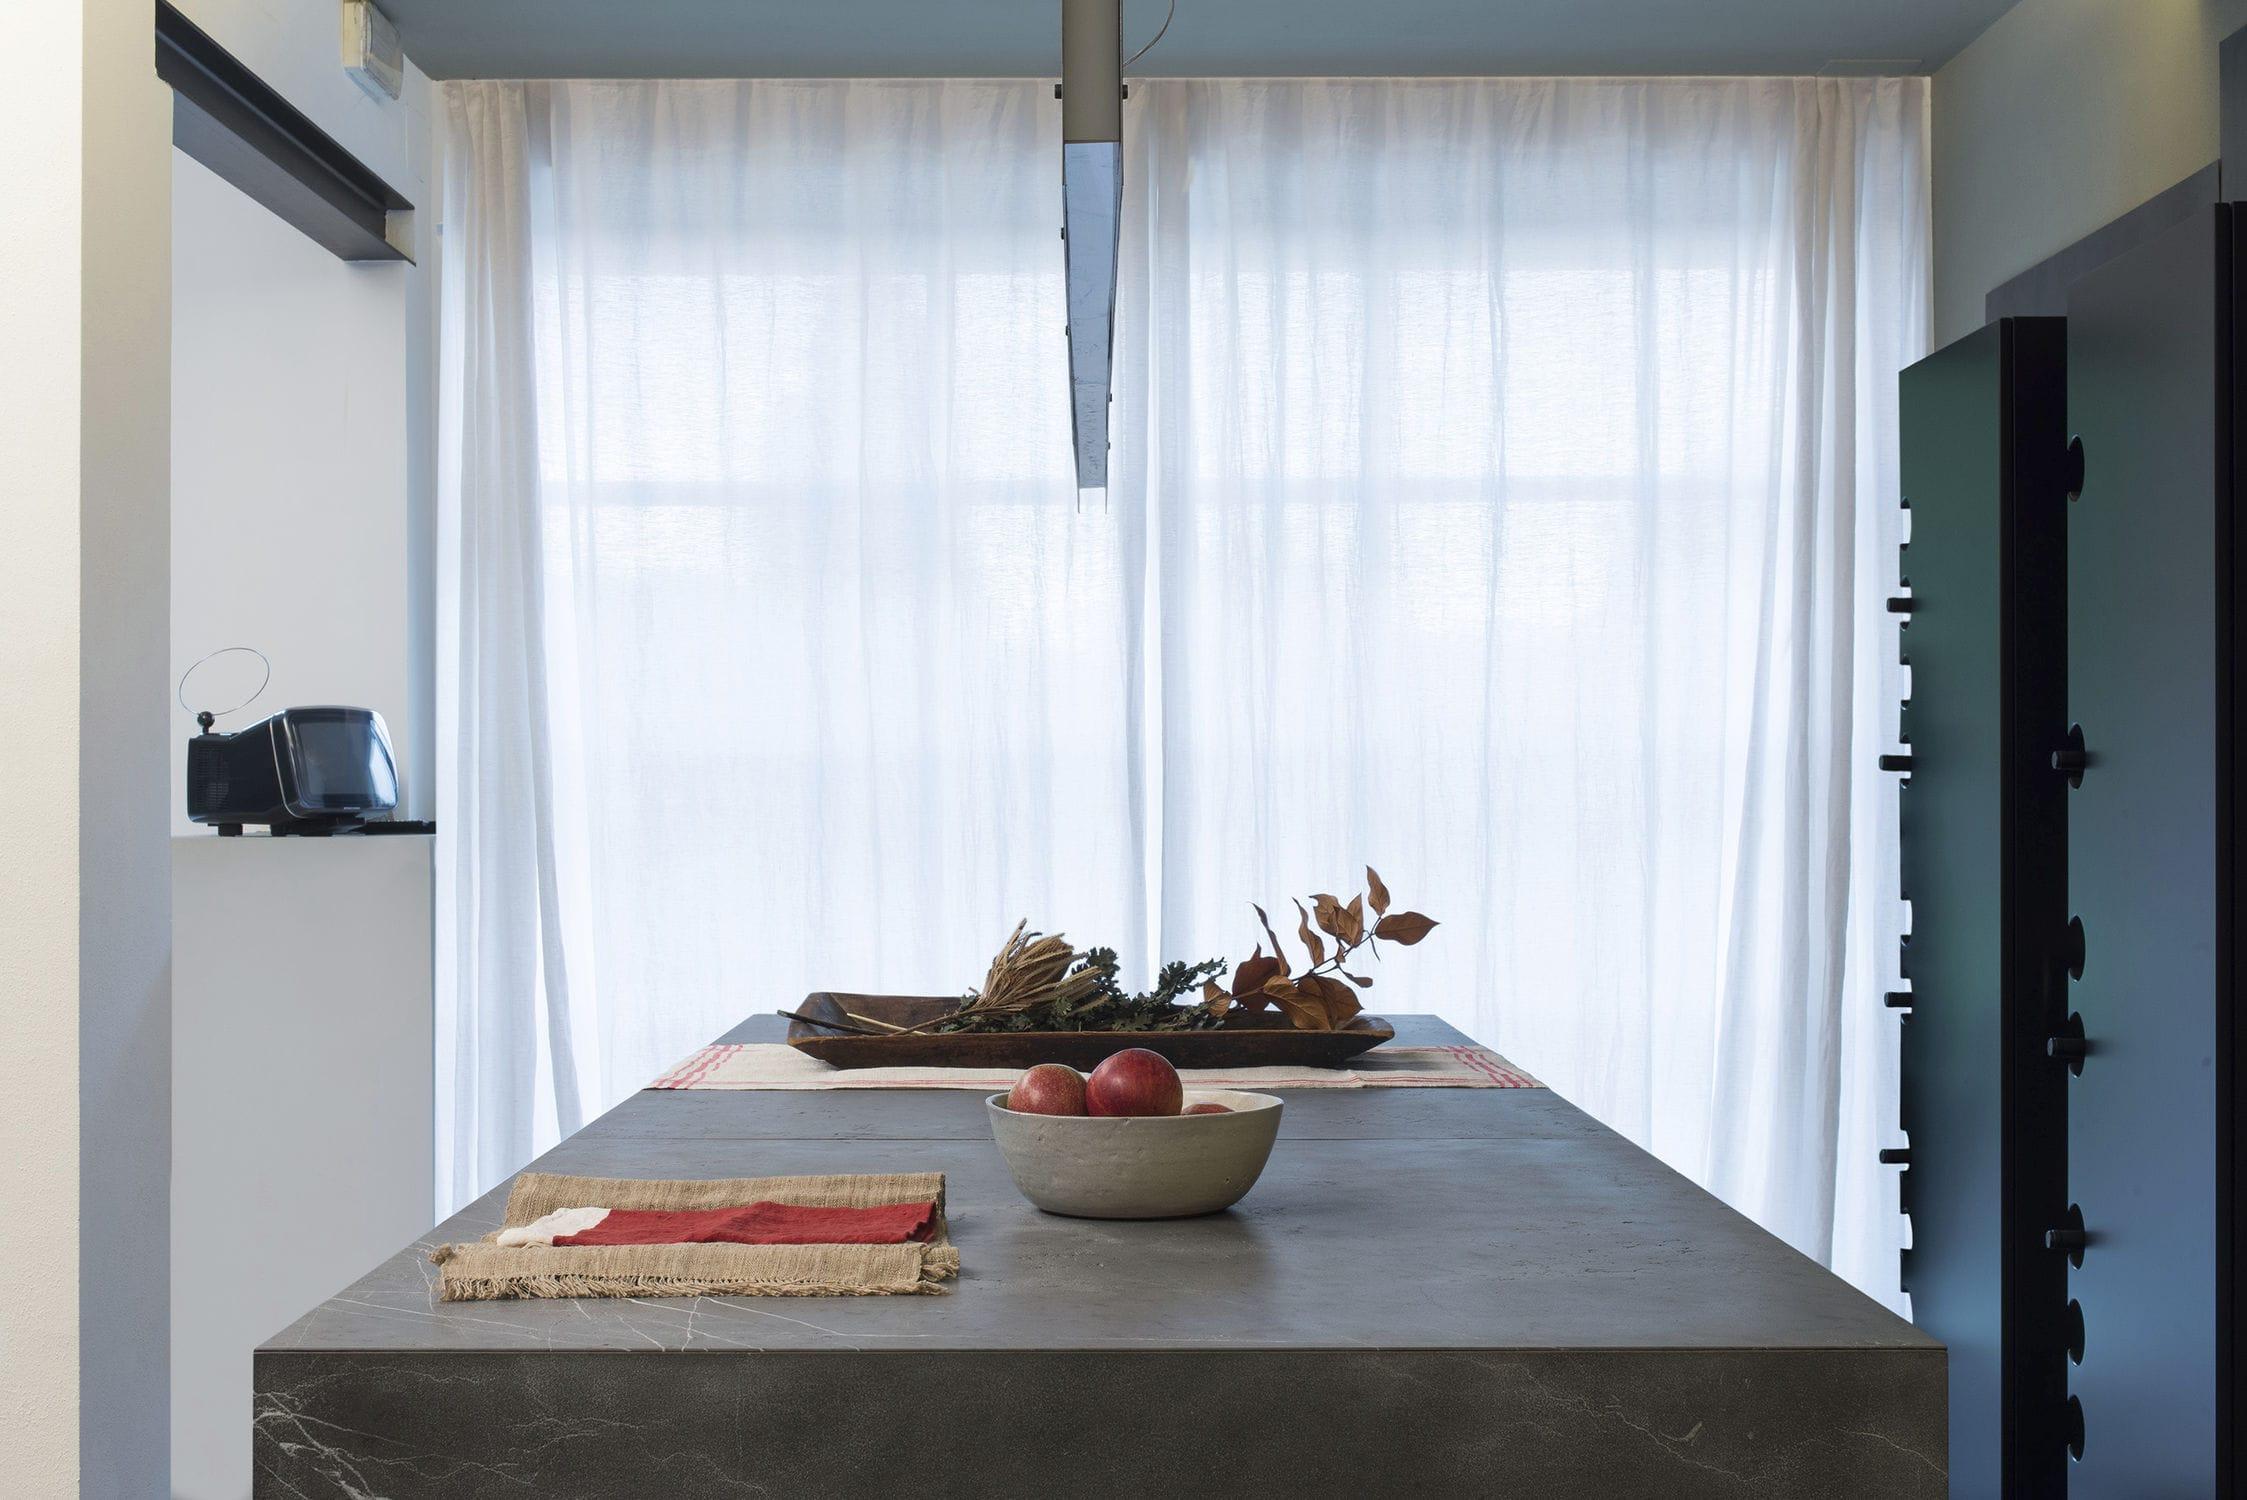 Moderne Küche / aus Stein / Kochinsel - 20141001_D90_ACCIAIO ...